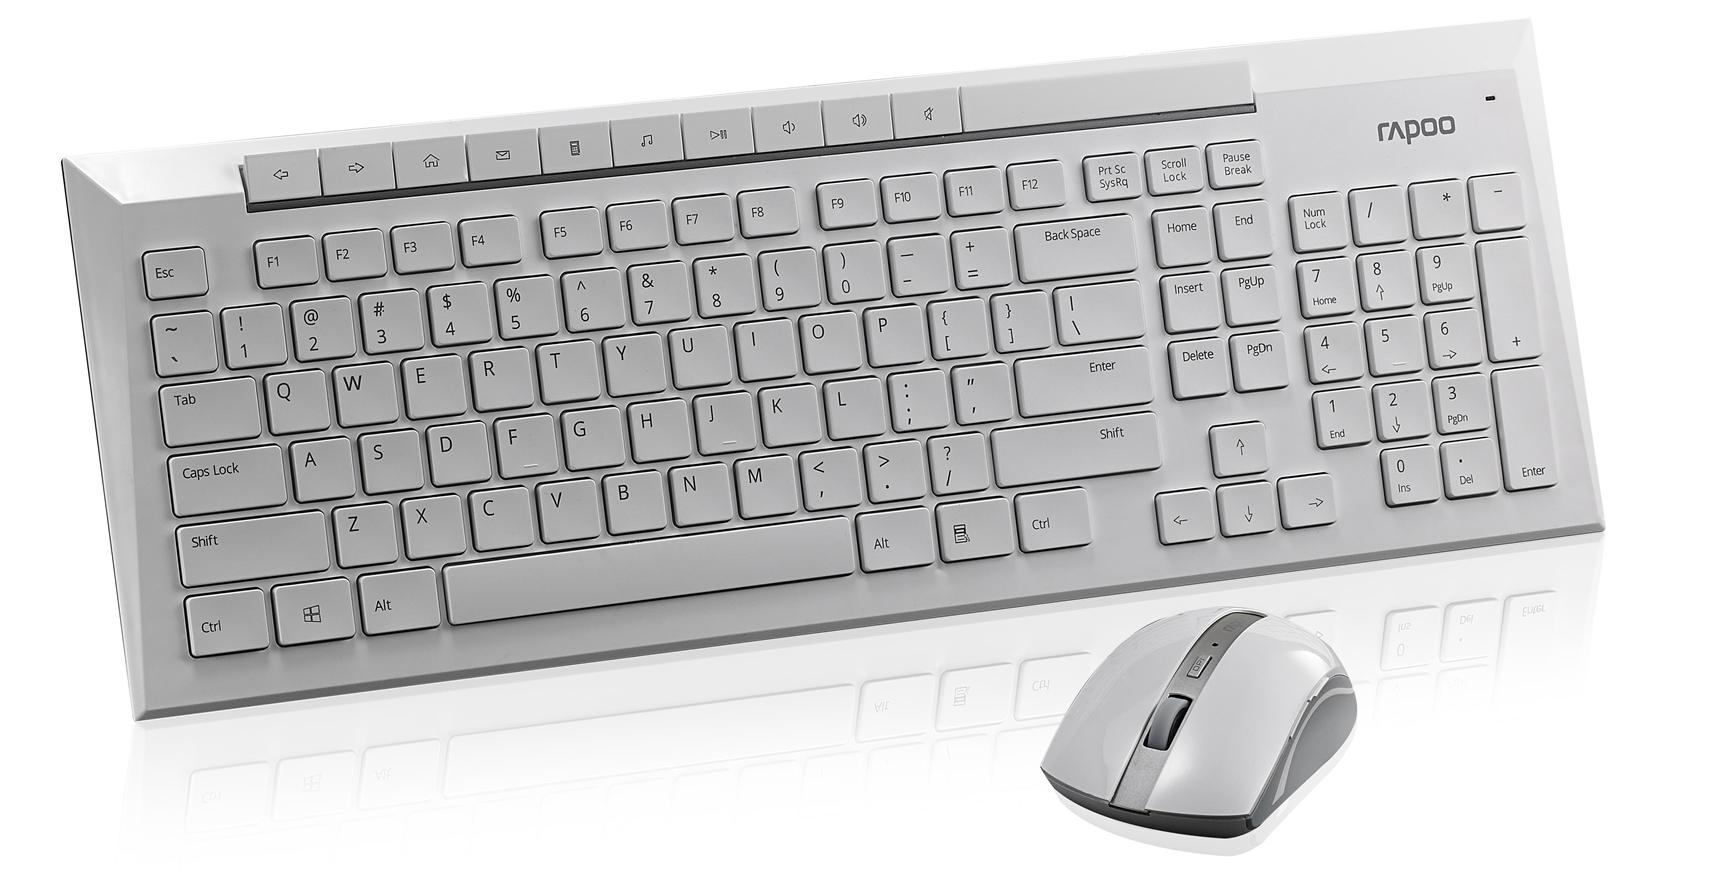 ugra.ru - Handheld Wireless Keyboard & Touchpad